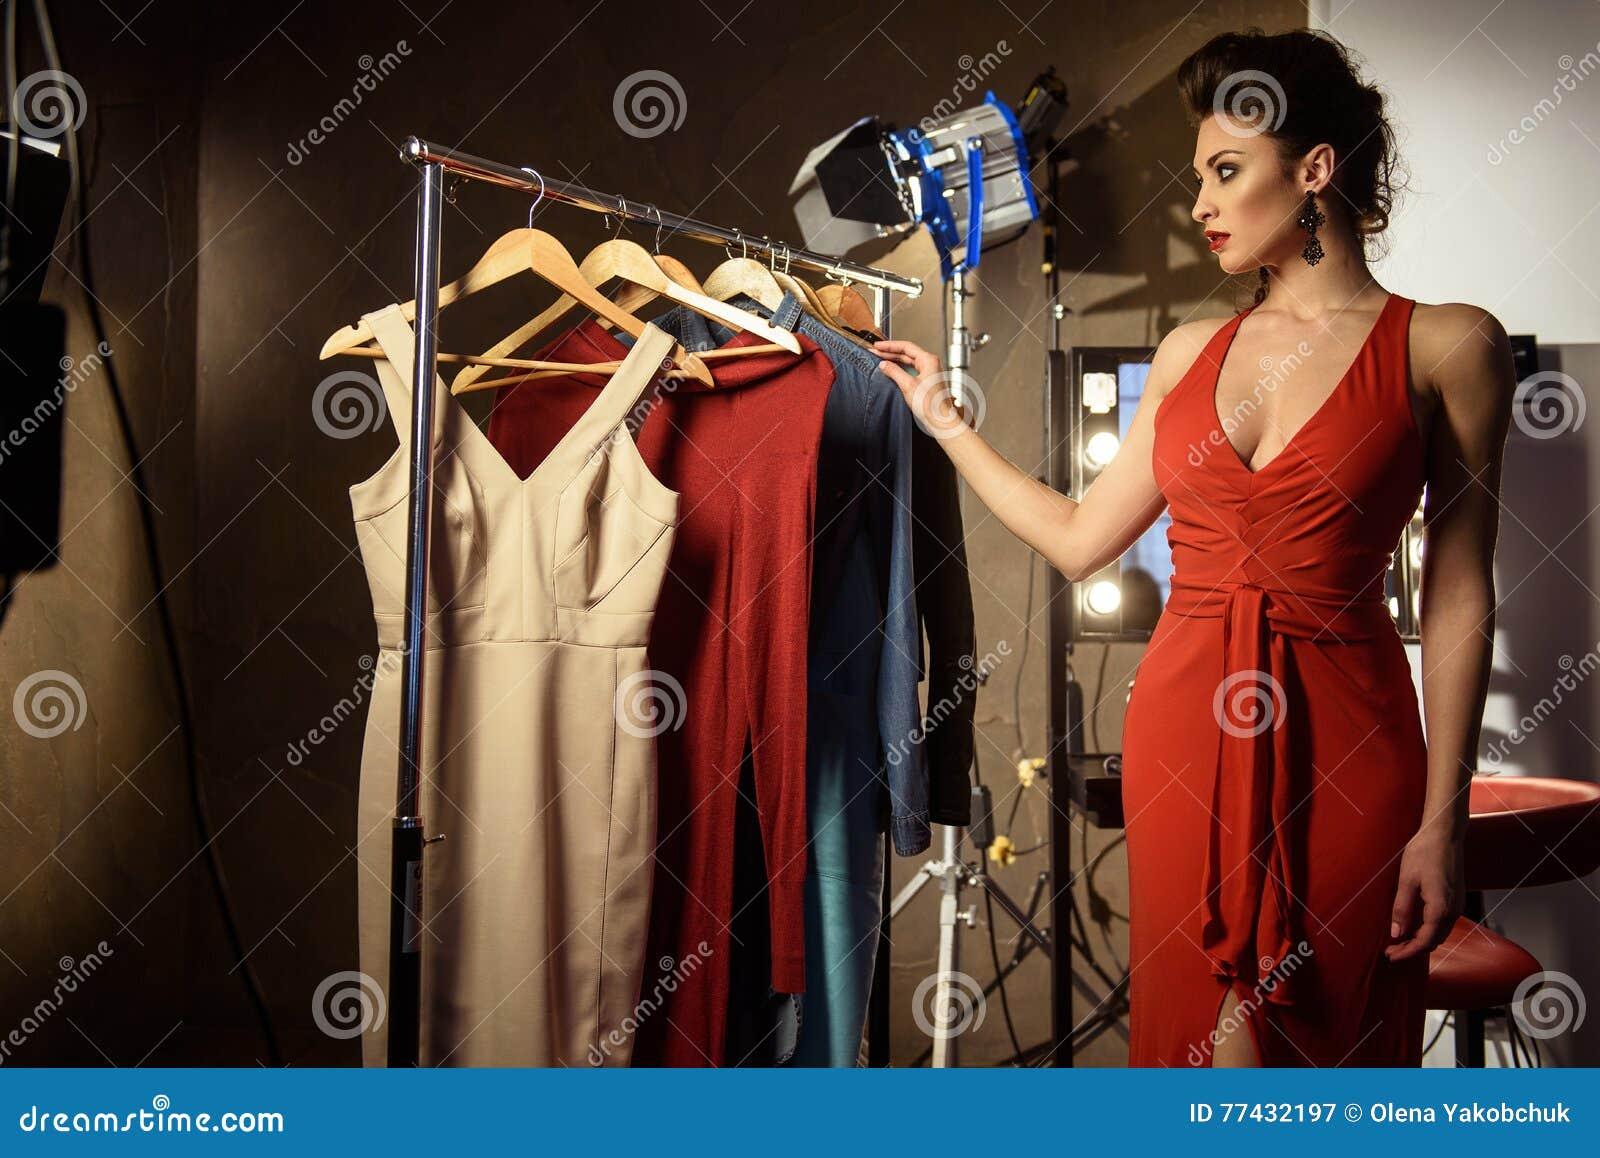 Pretty Female Model In Dressing Room Stock Photo - Image: 77432197